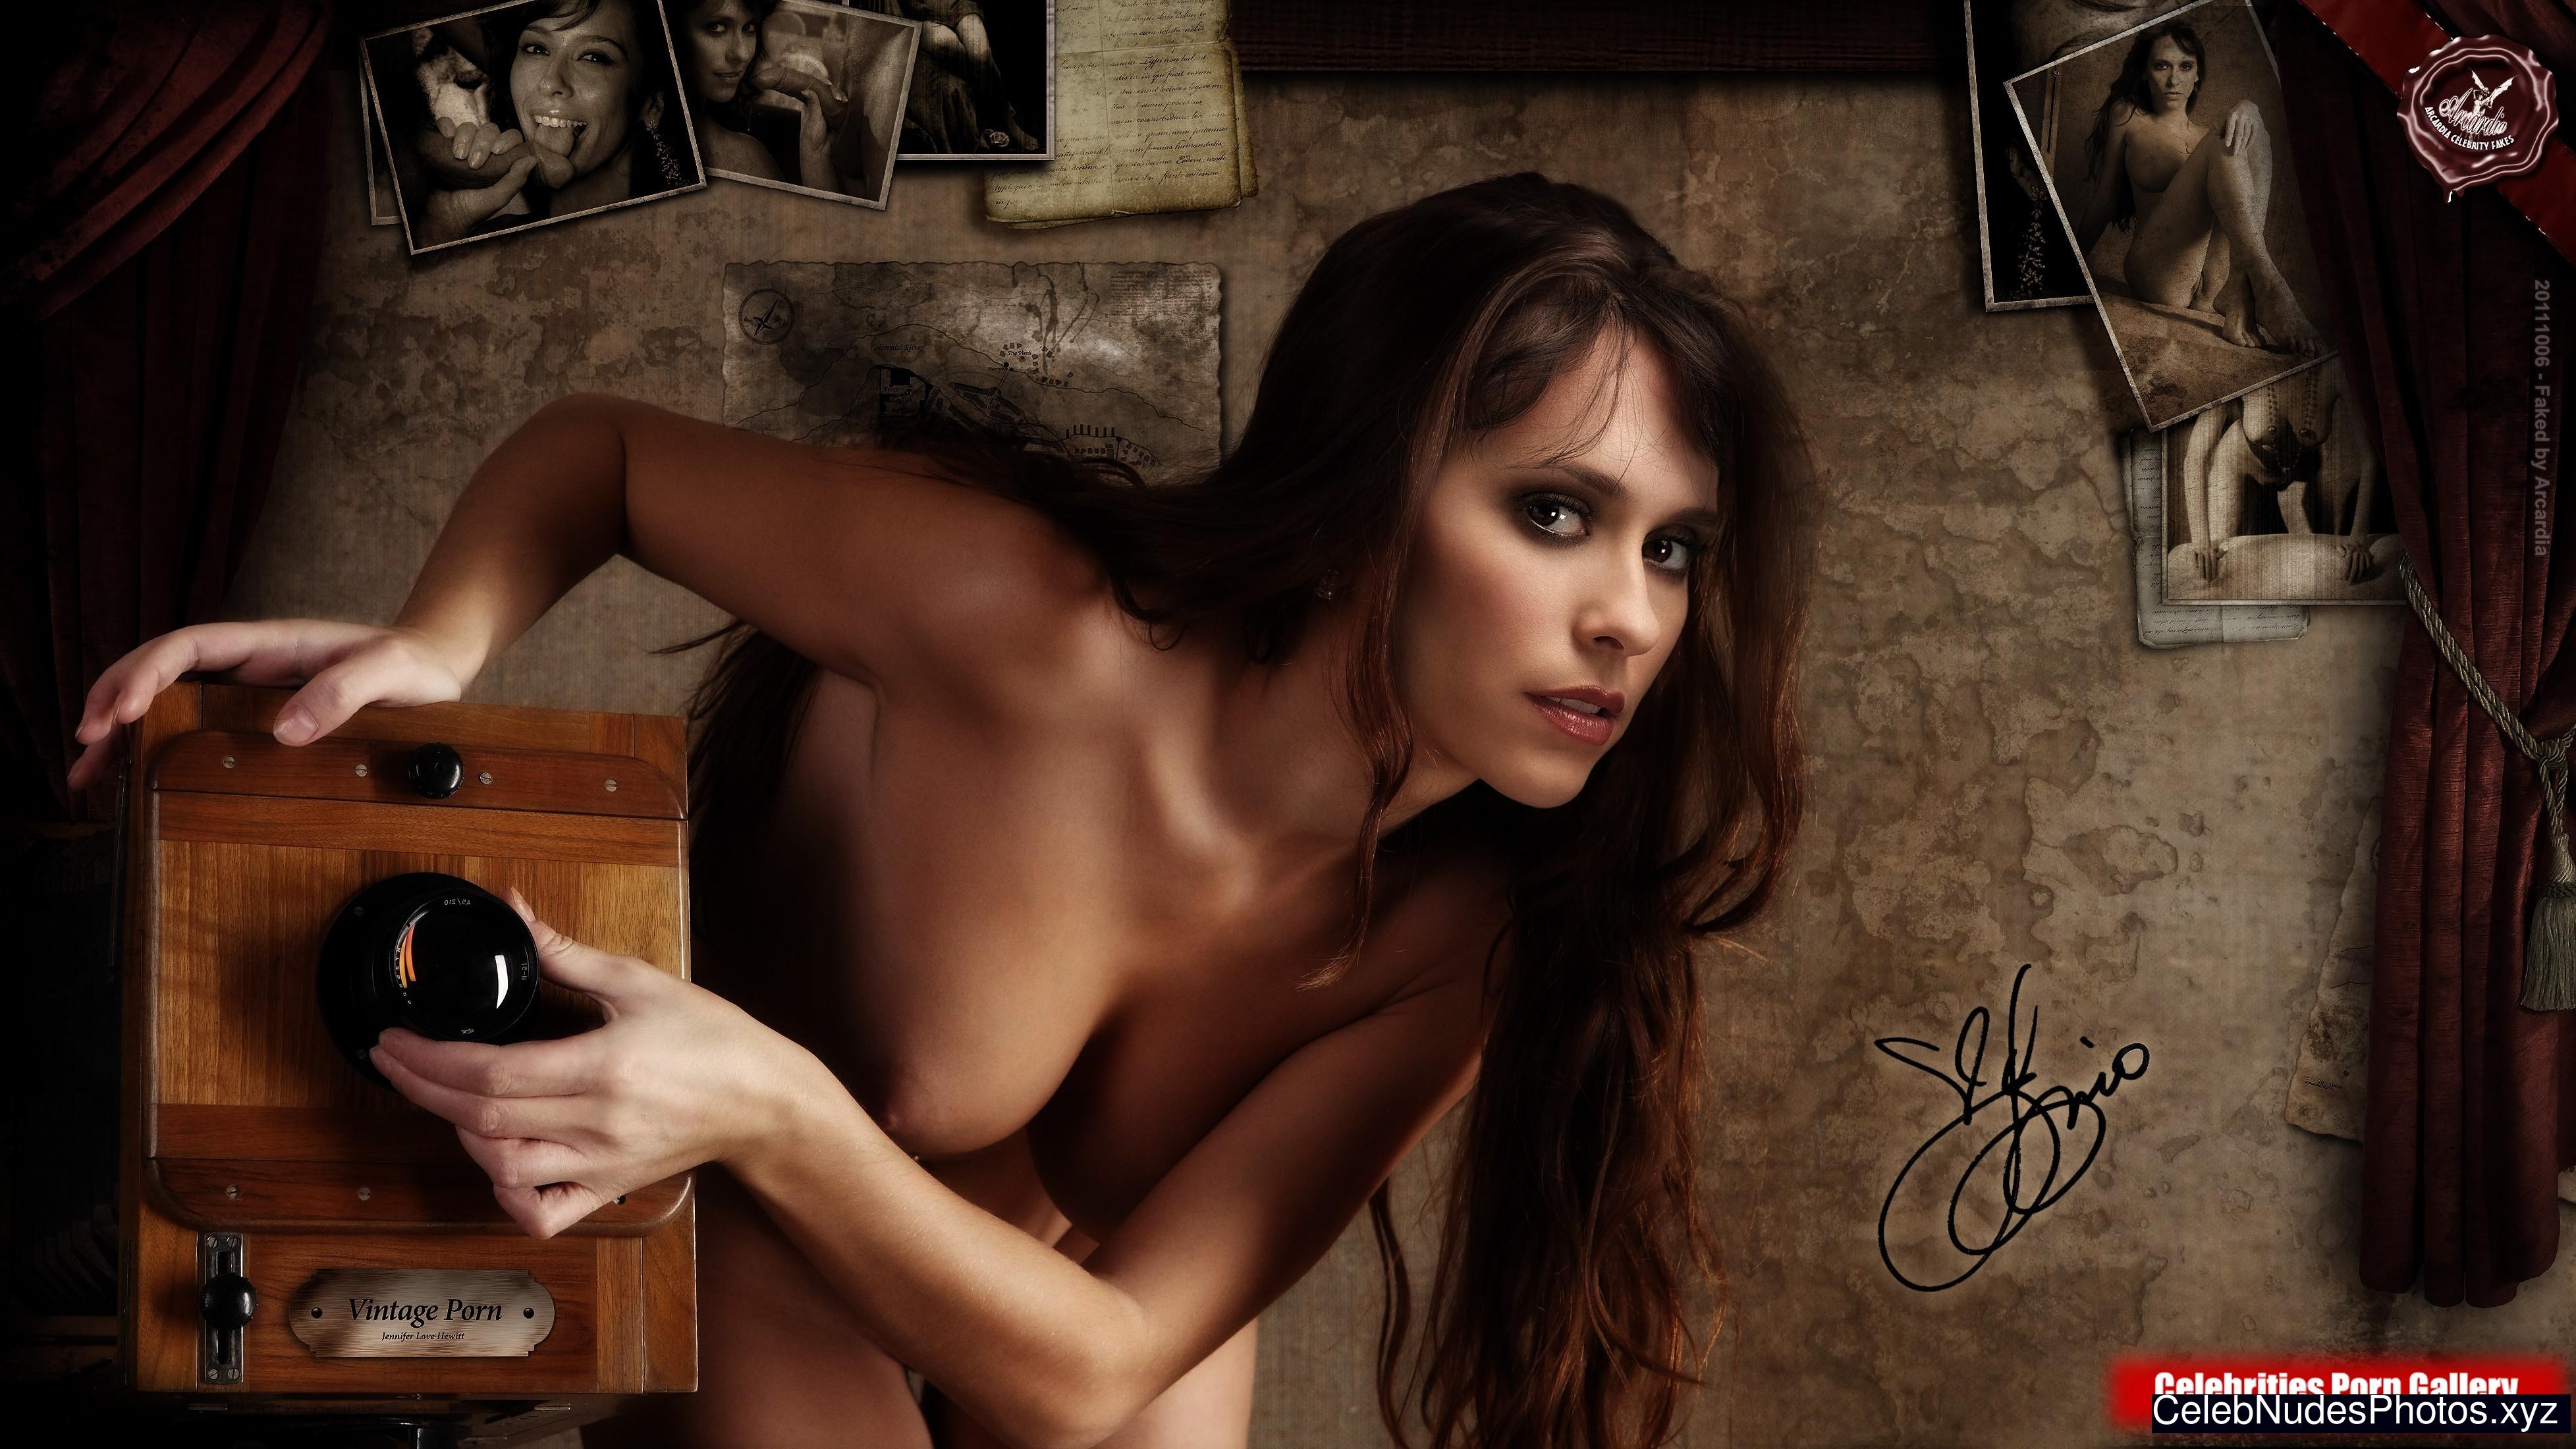 Chelsea brooke pereira nude XXX